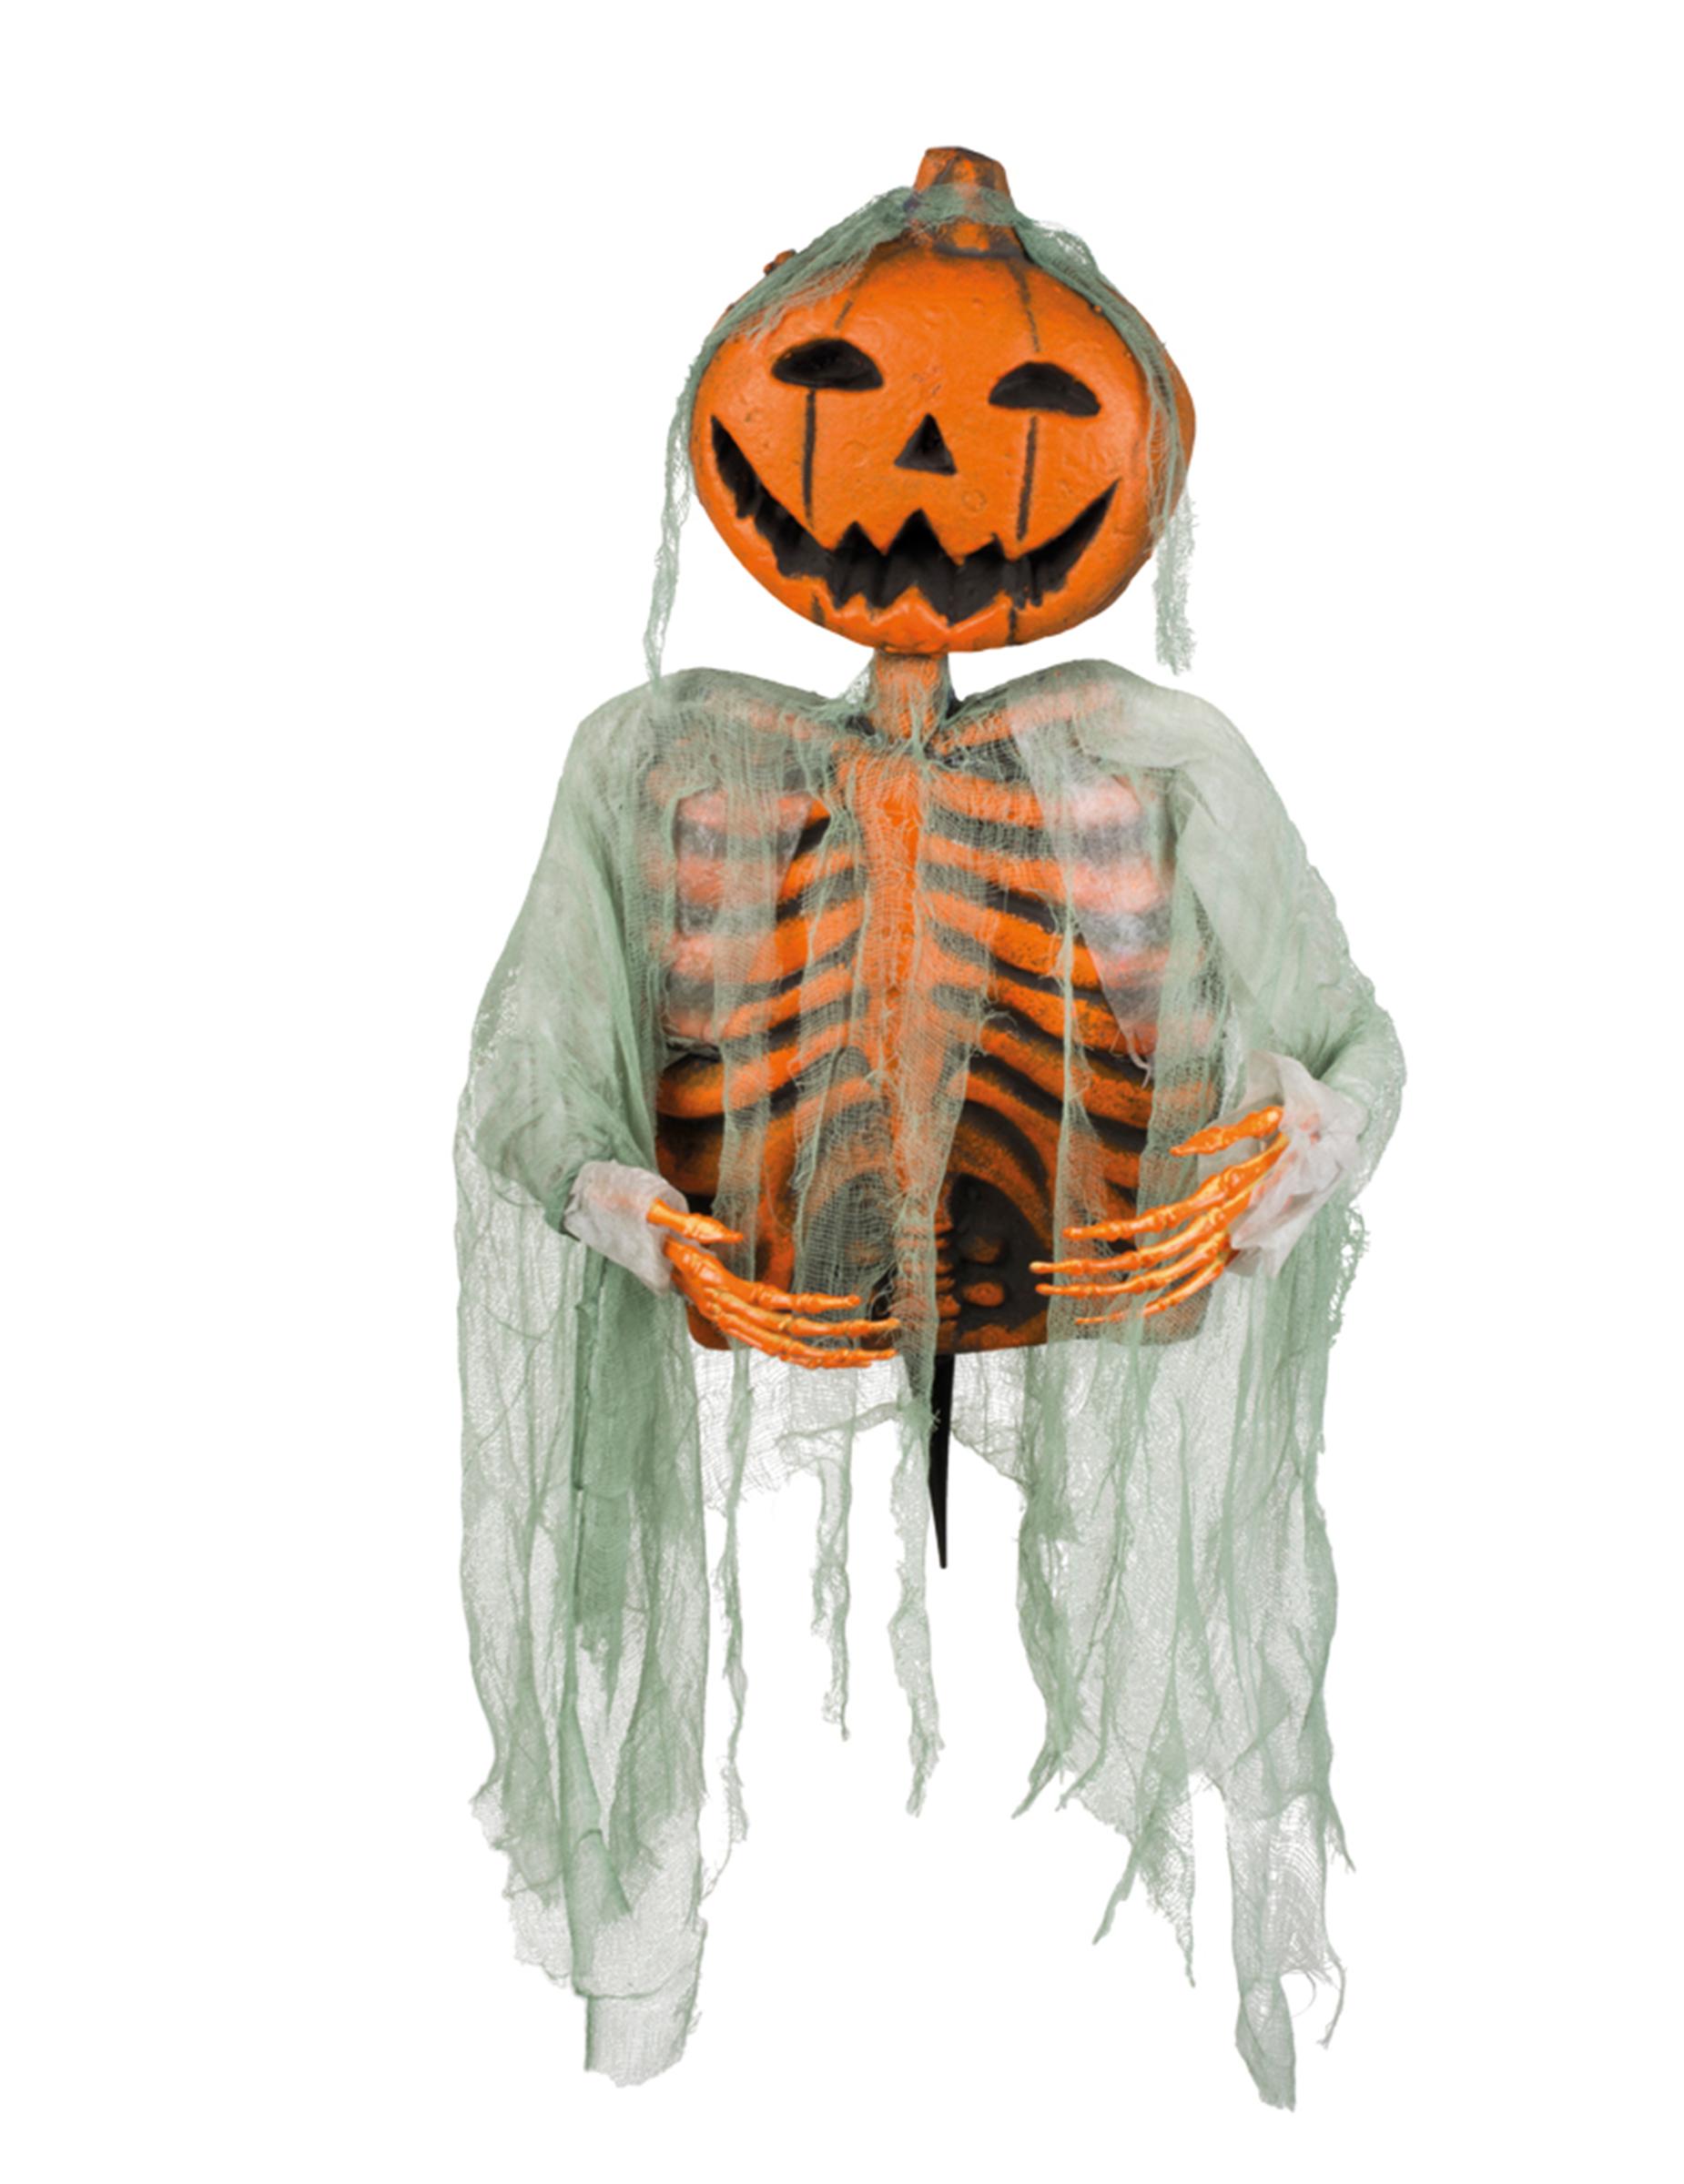 halloween deko skelett mit k rbiskopf schwarz orange 52cm. Black Bedroom Furniture Sets. Home Design Ideas